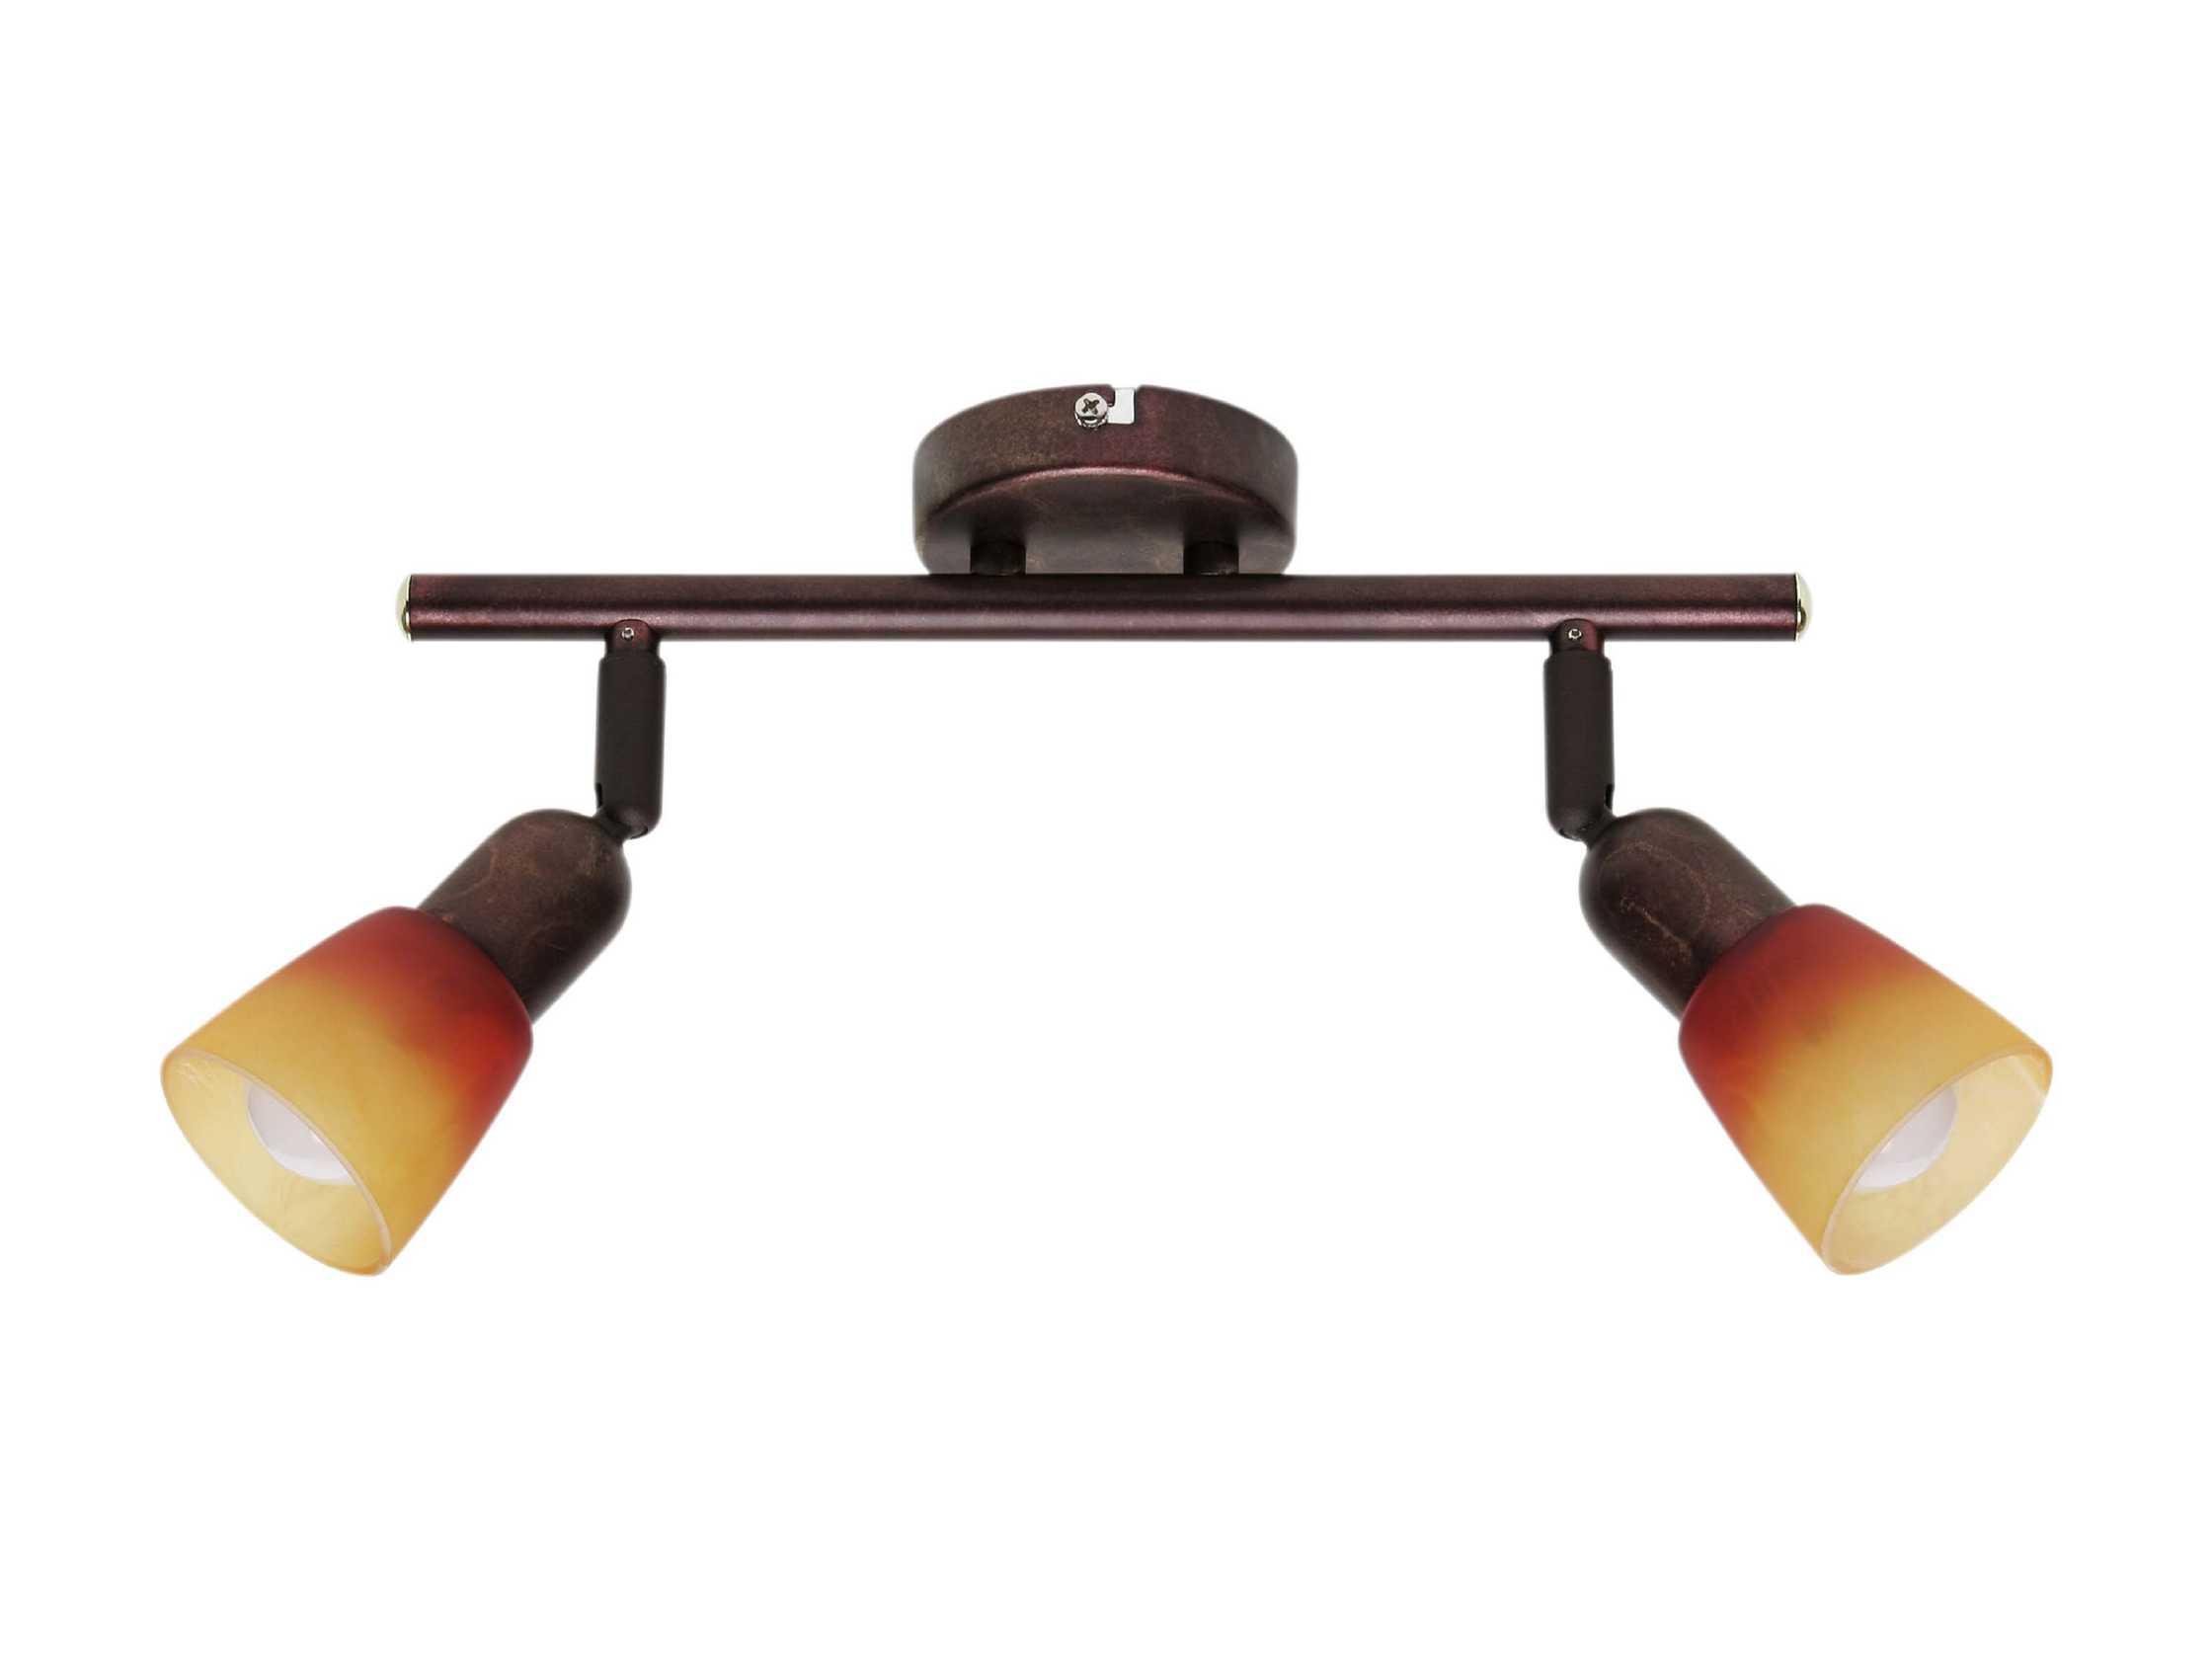 Лампа потолочная SofiaСпоты<br>&amp;lt;div&amp;gt;Цоколь: E14&amp;lt;/div&amp;gt;&amp;lt;div&amp;gt;Мощность лампы: 40W&amp;lt;/div&amp;gt;&amp;lt;div&amp;gt;Количество ламп: 2&amp;lt;/div&amp;gt;&amp;lt;div&amp;gt;Наличие ламп: отсутствуют&amp;lt;/div&amp;gt;<br><br>Material: Стекло<br>Ширина см: 33<br>Высота см: 21<br>Глубина см: 10